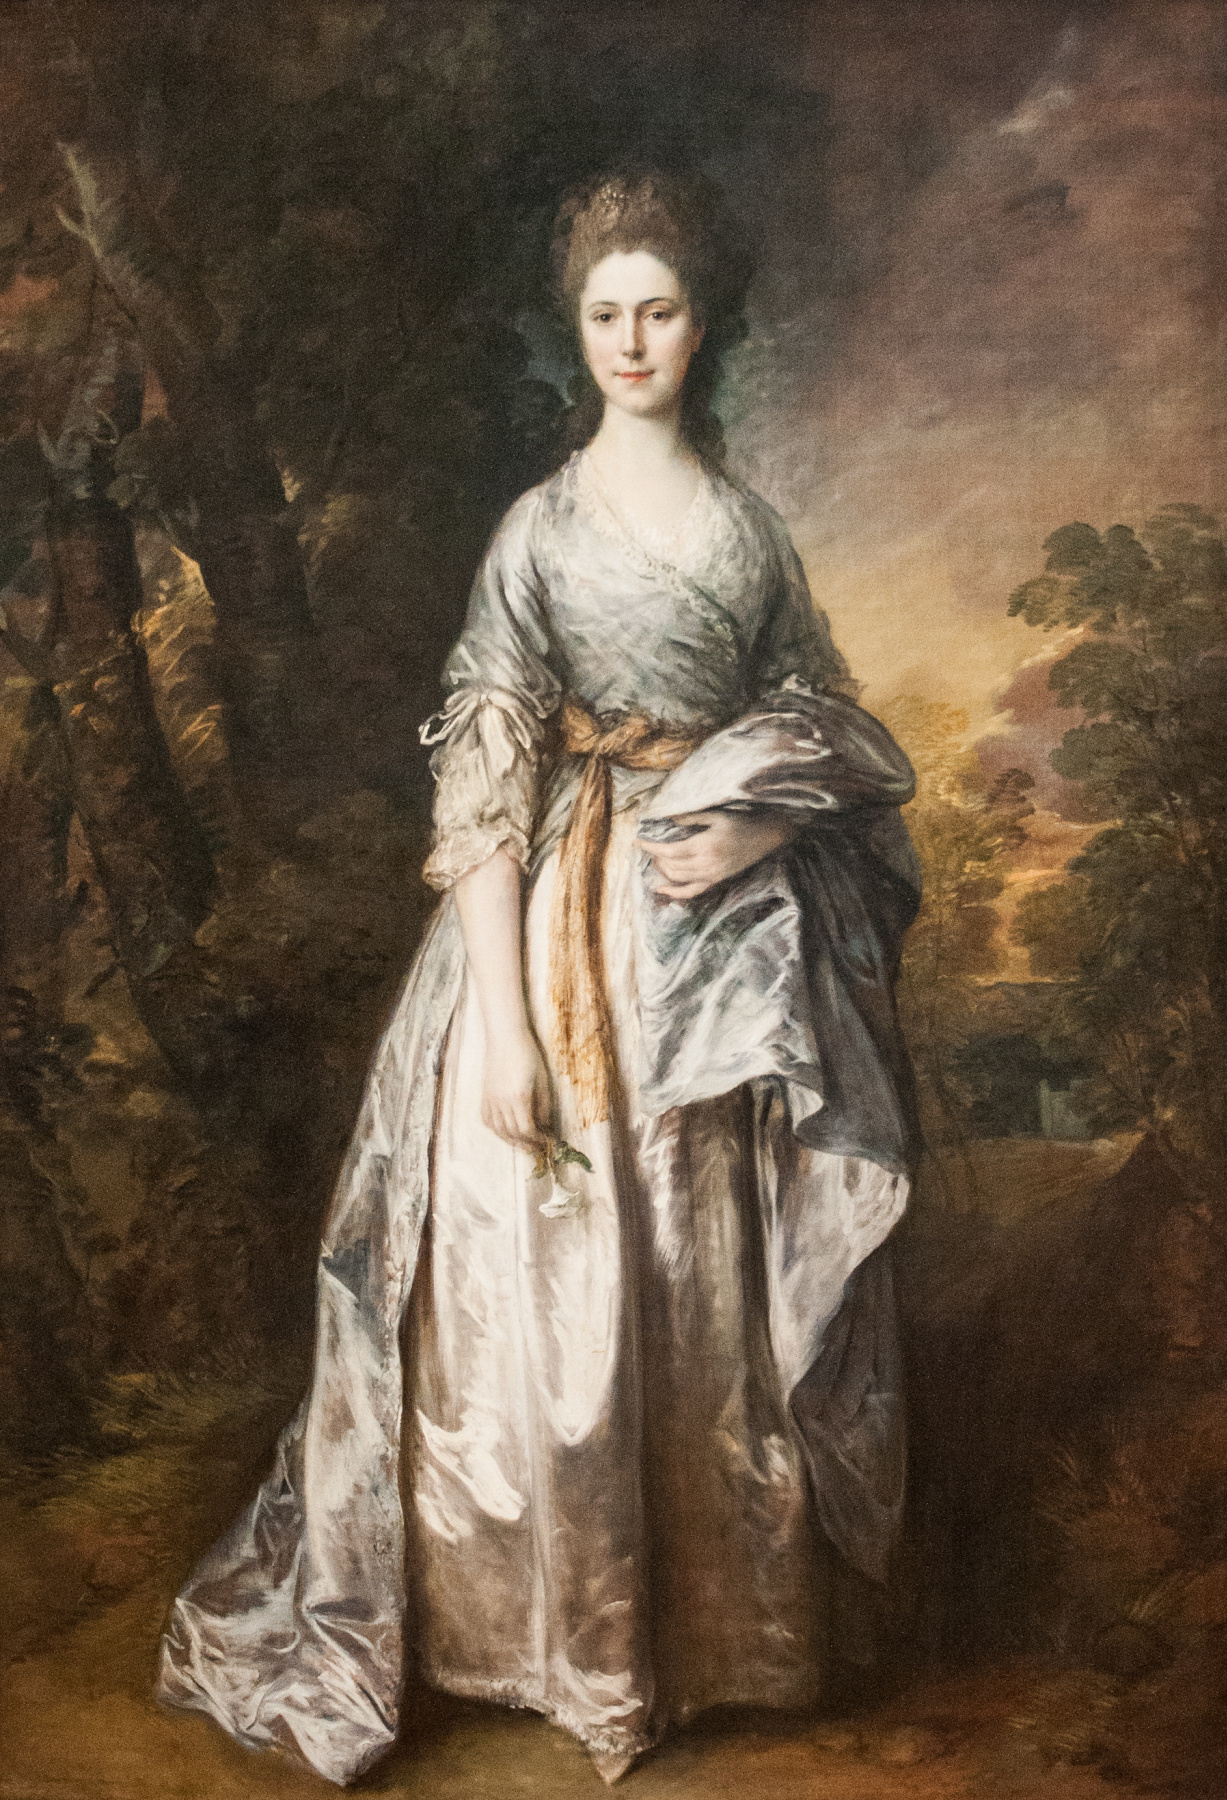 Thomas Gainsborough. Portrait of Maria, lady Eardley